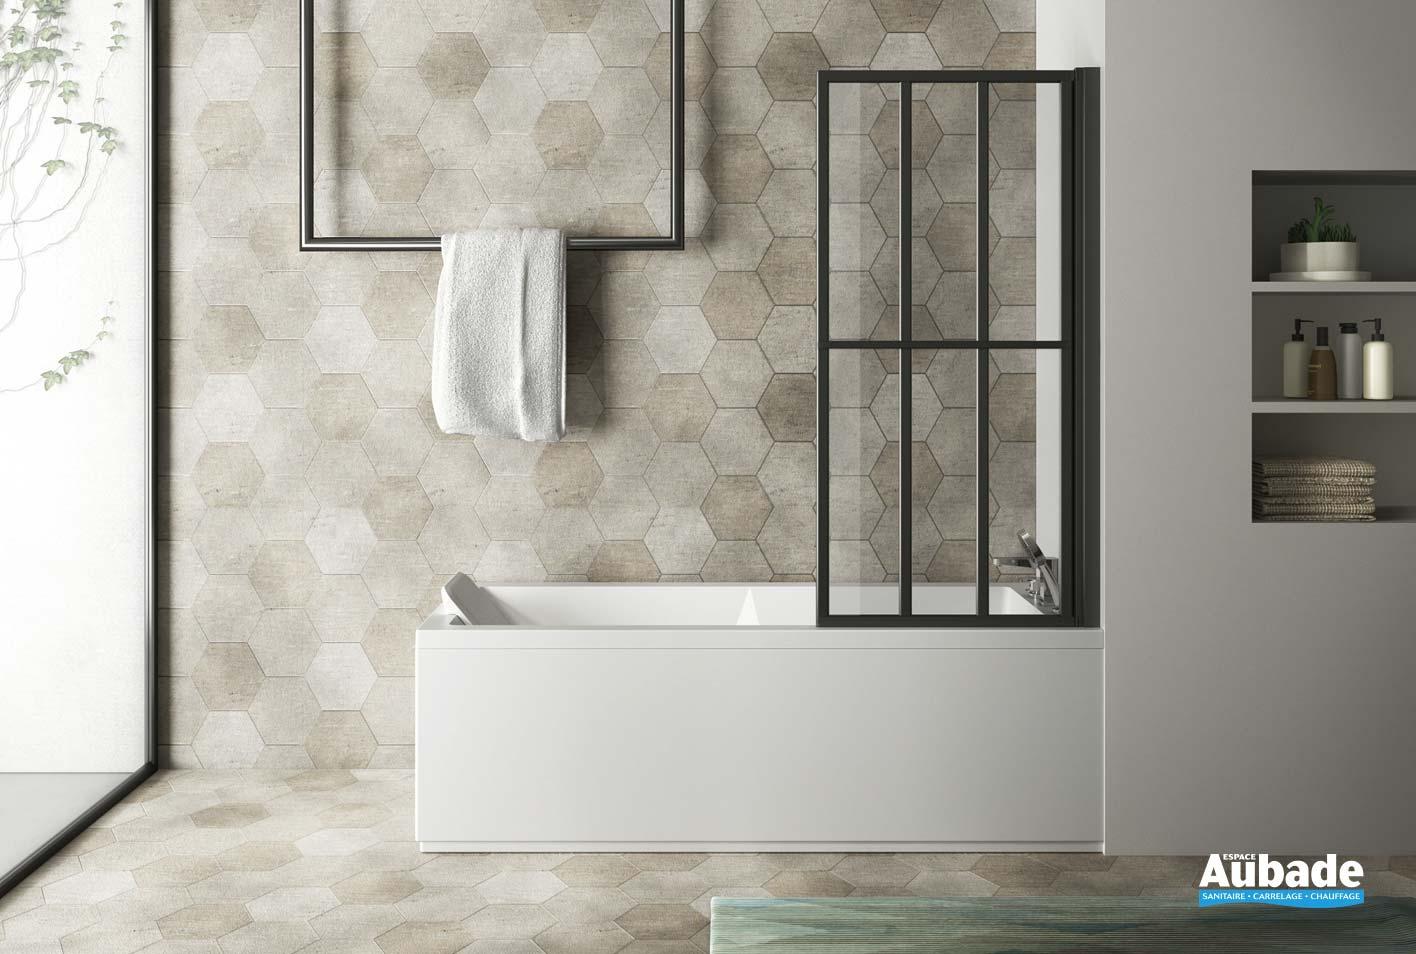 Poser Une Baignoire Avec Rebord pare-baignoire loft screen de la marque jacuzzi